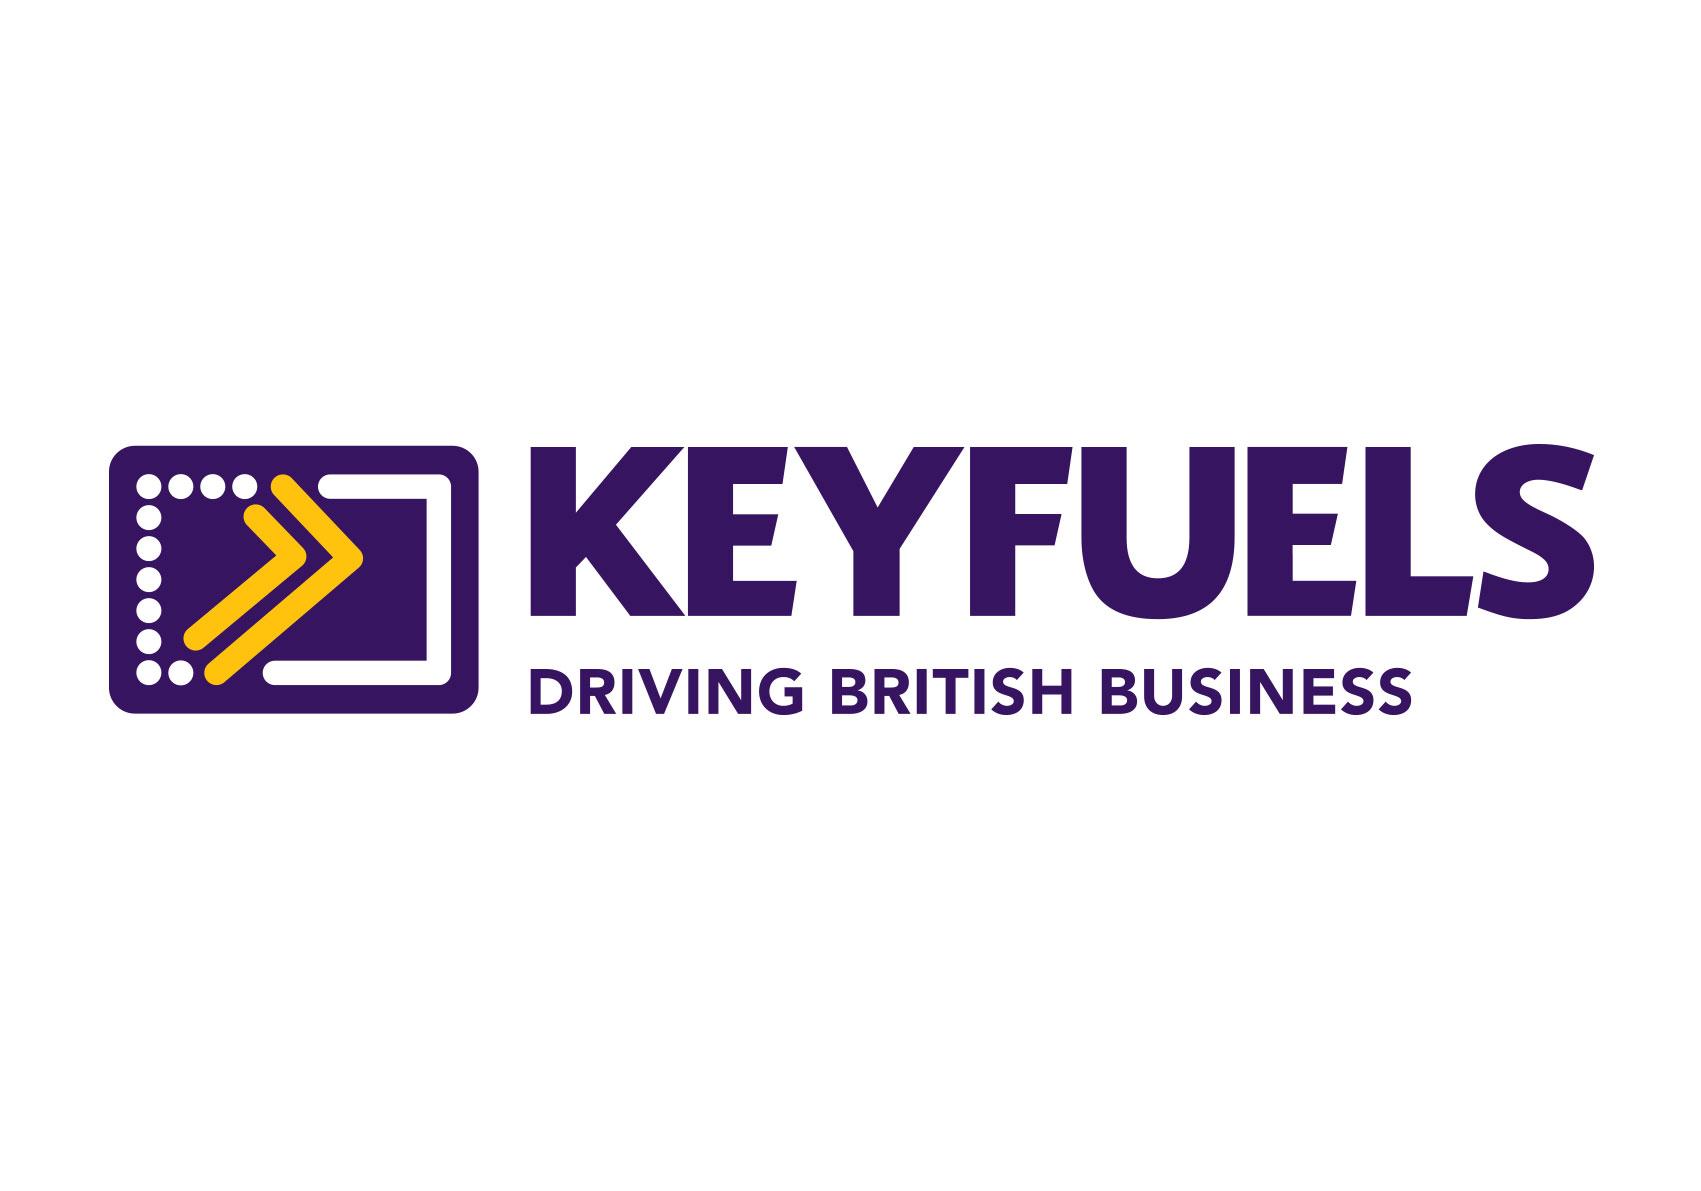 Keyfuels, a FLEETCOR company